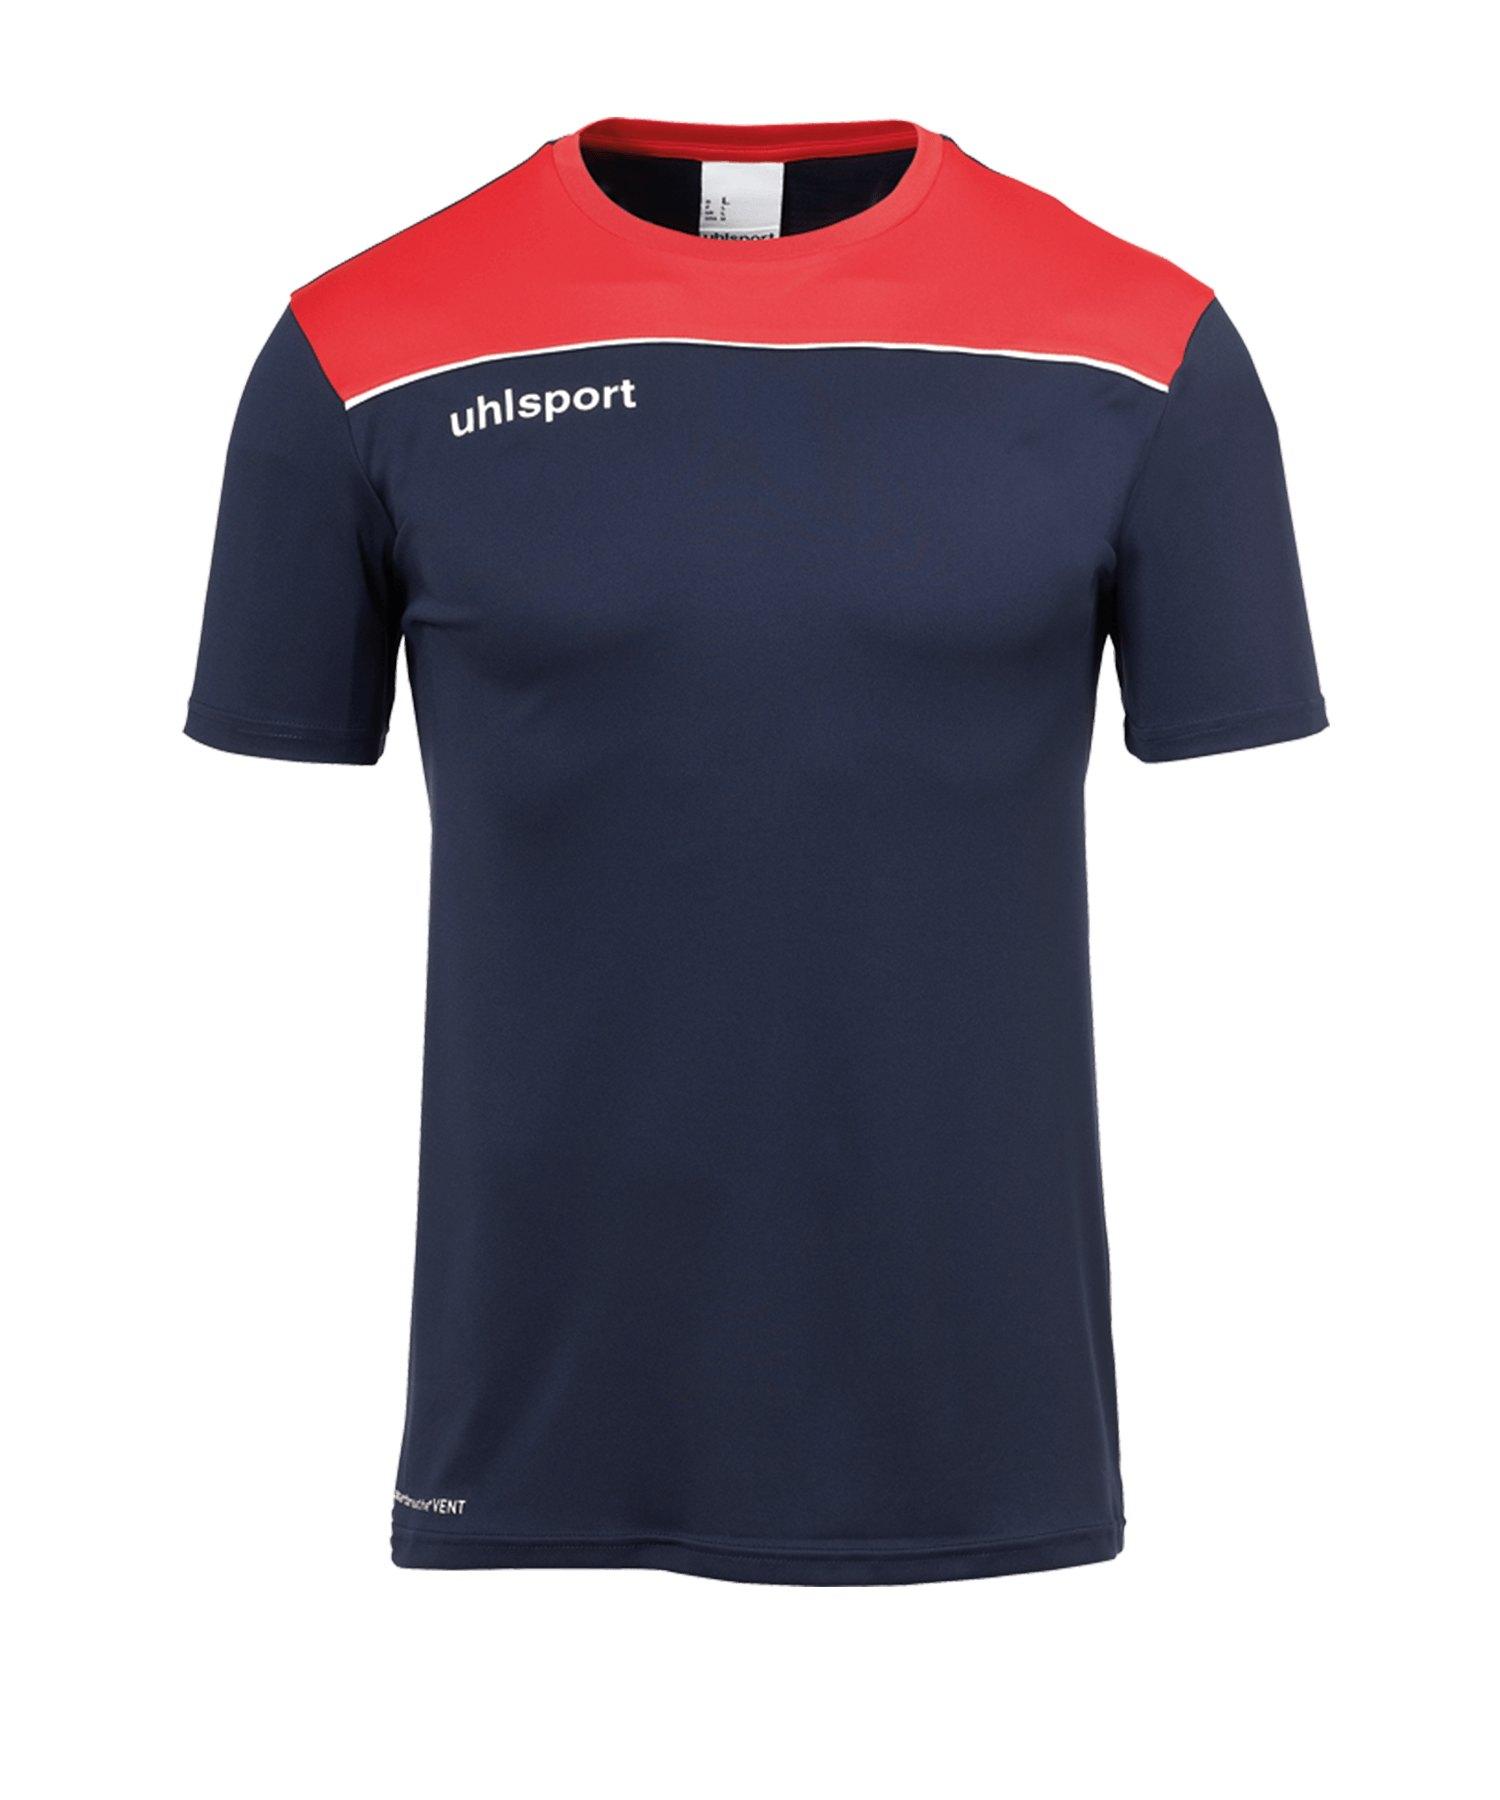 Uhlsport Offense 23 Trainingsshirt Kids Blau F10 - blau